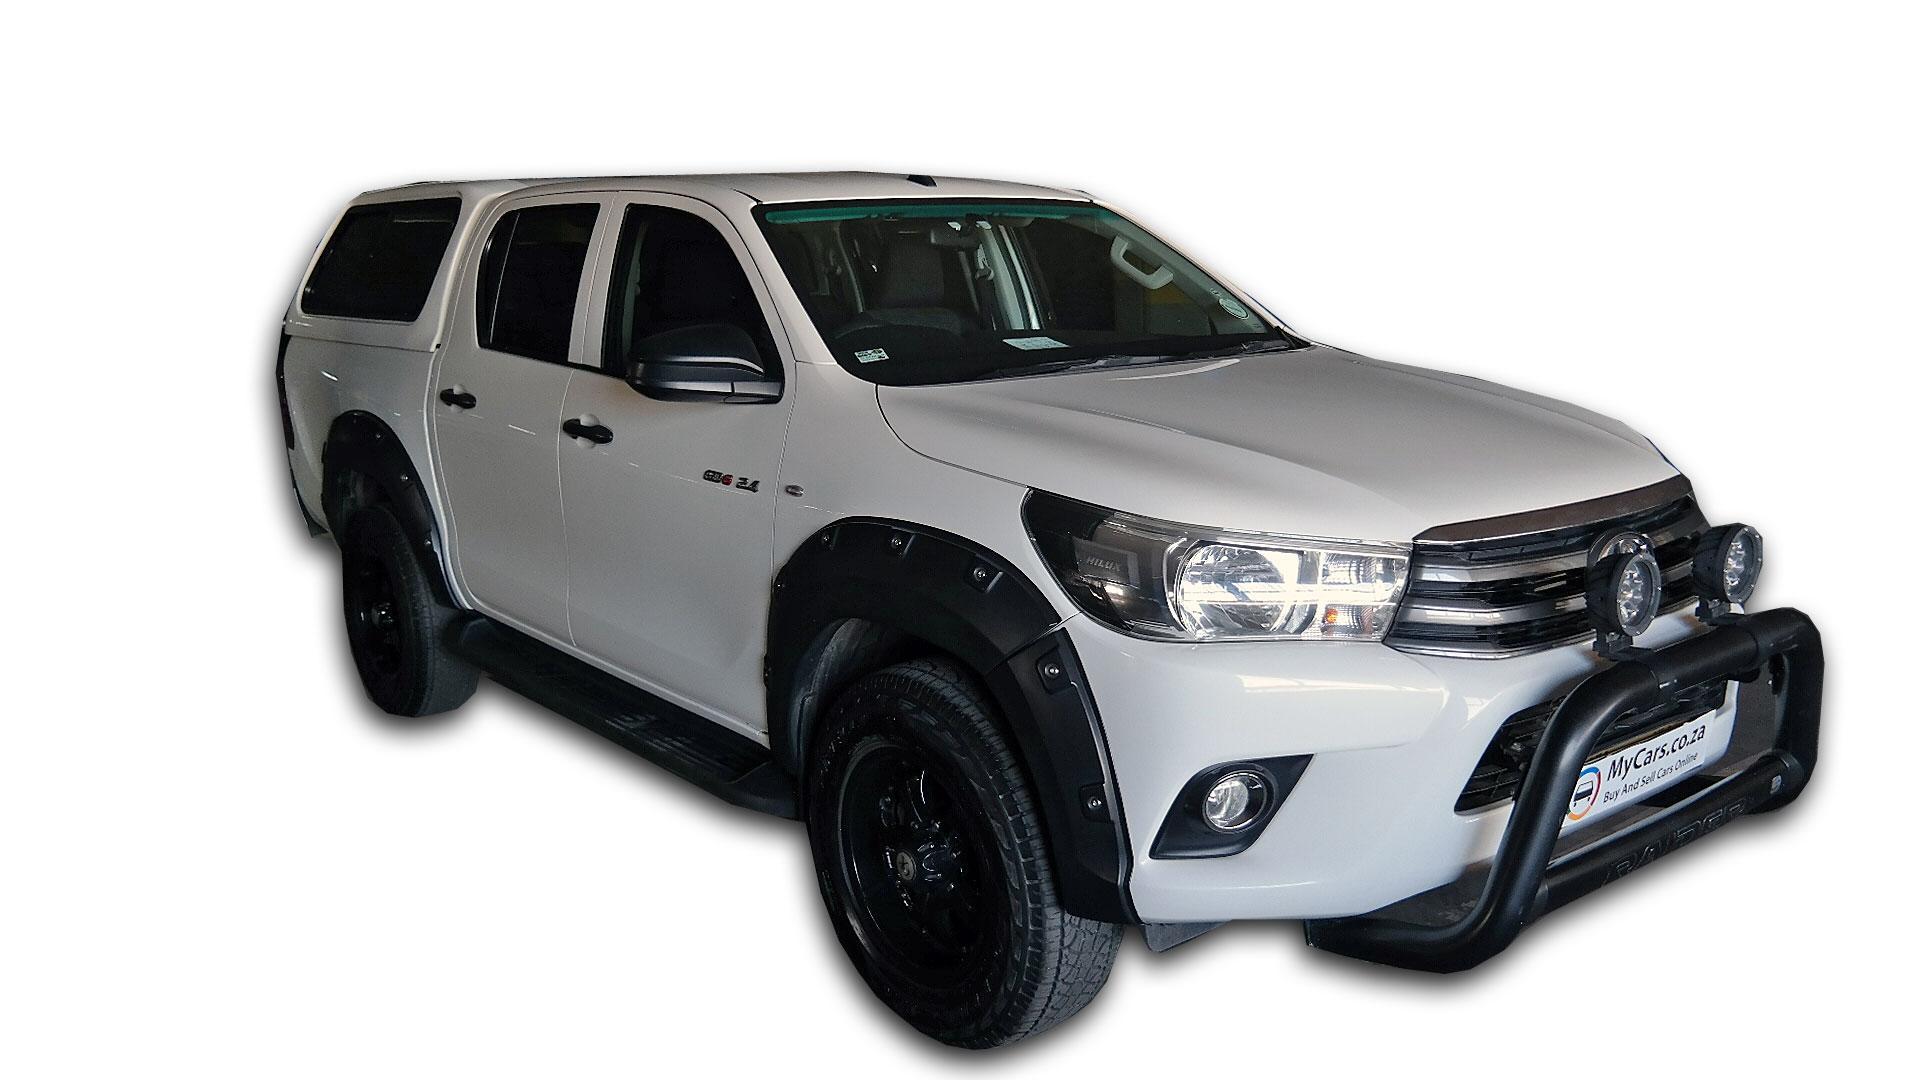 Toyota Hilux 2.4 GD-6 SRX P